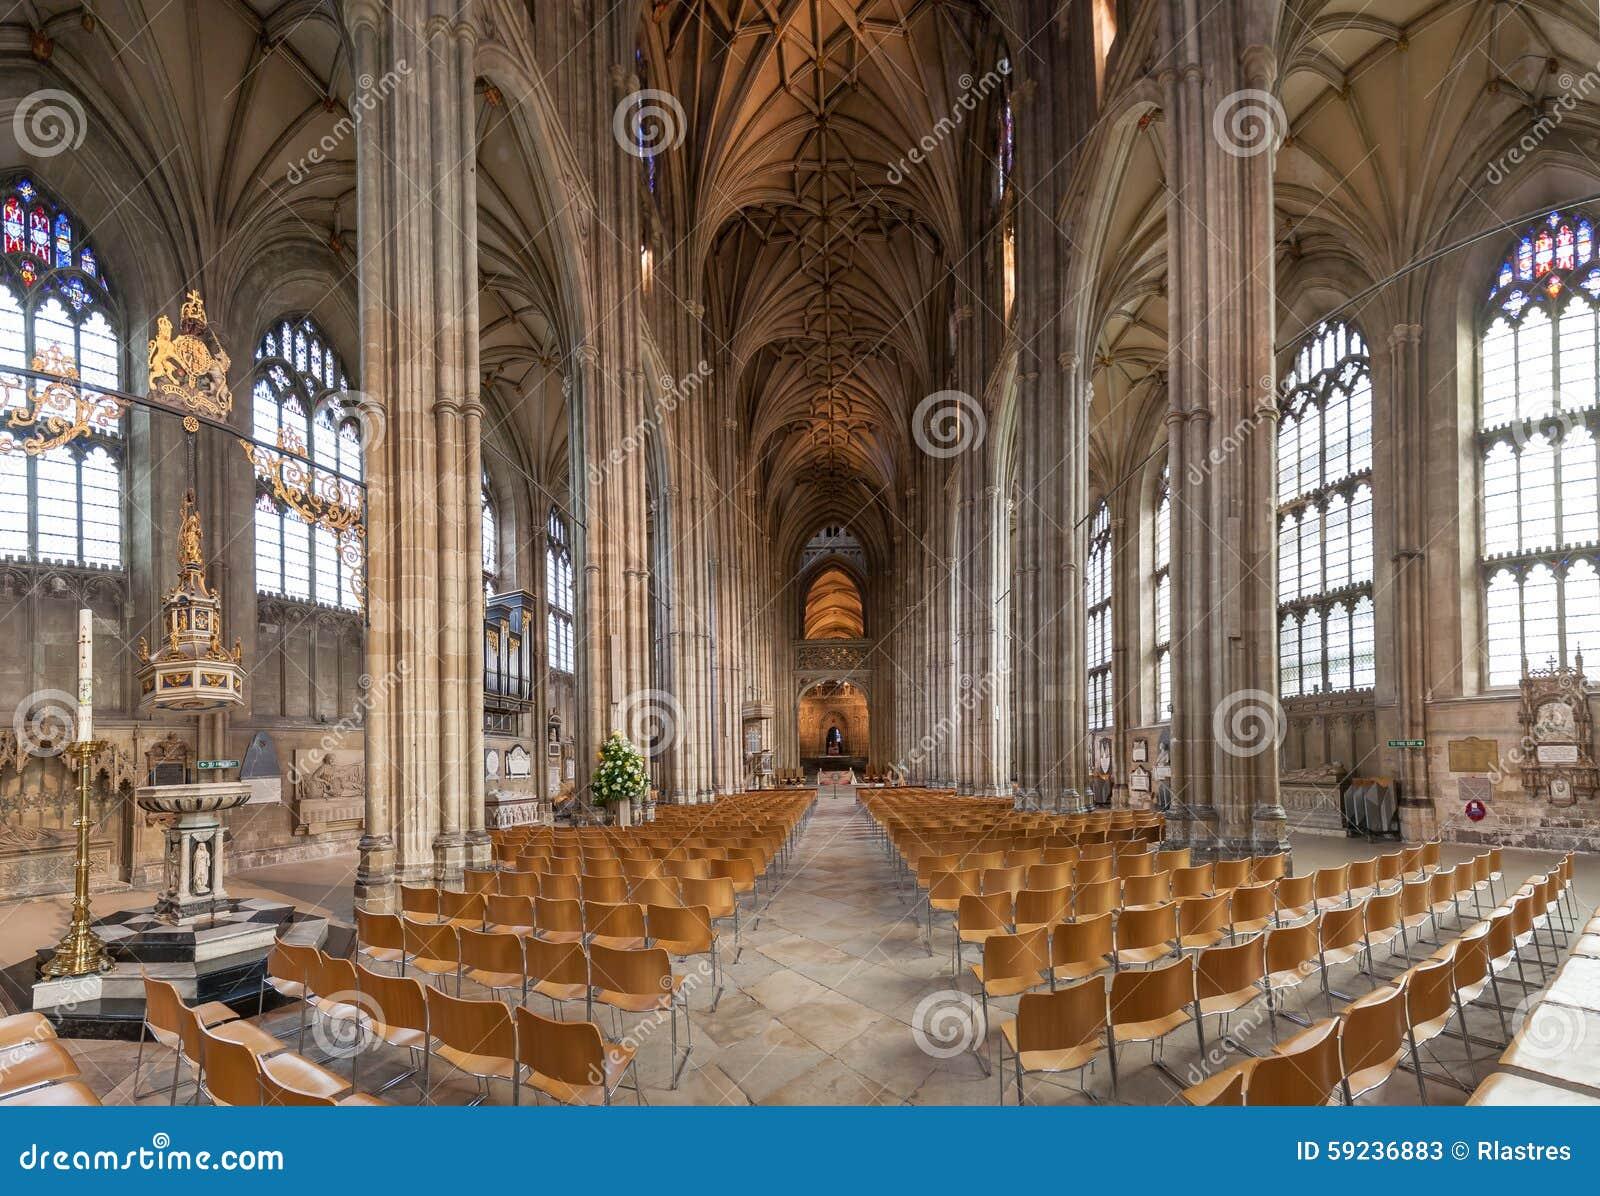 Interior de la catedral de Cantorbery, Kent, Inglaterra